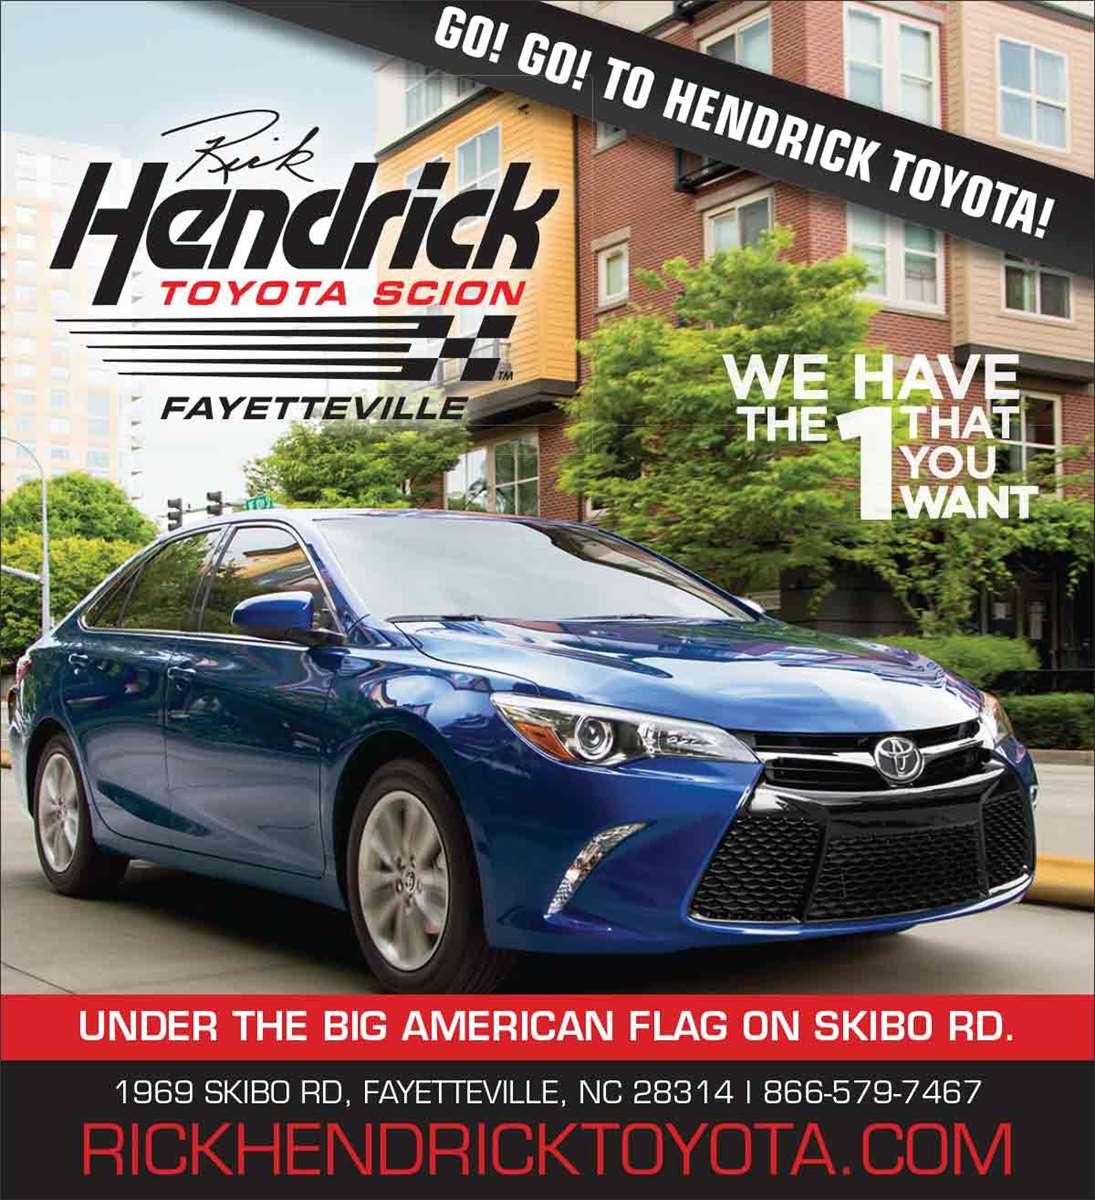 Rick Hendrick Toyota Scion